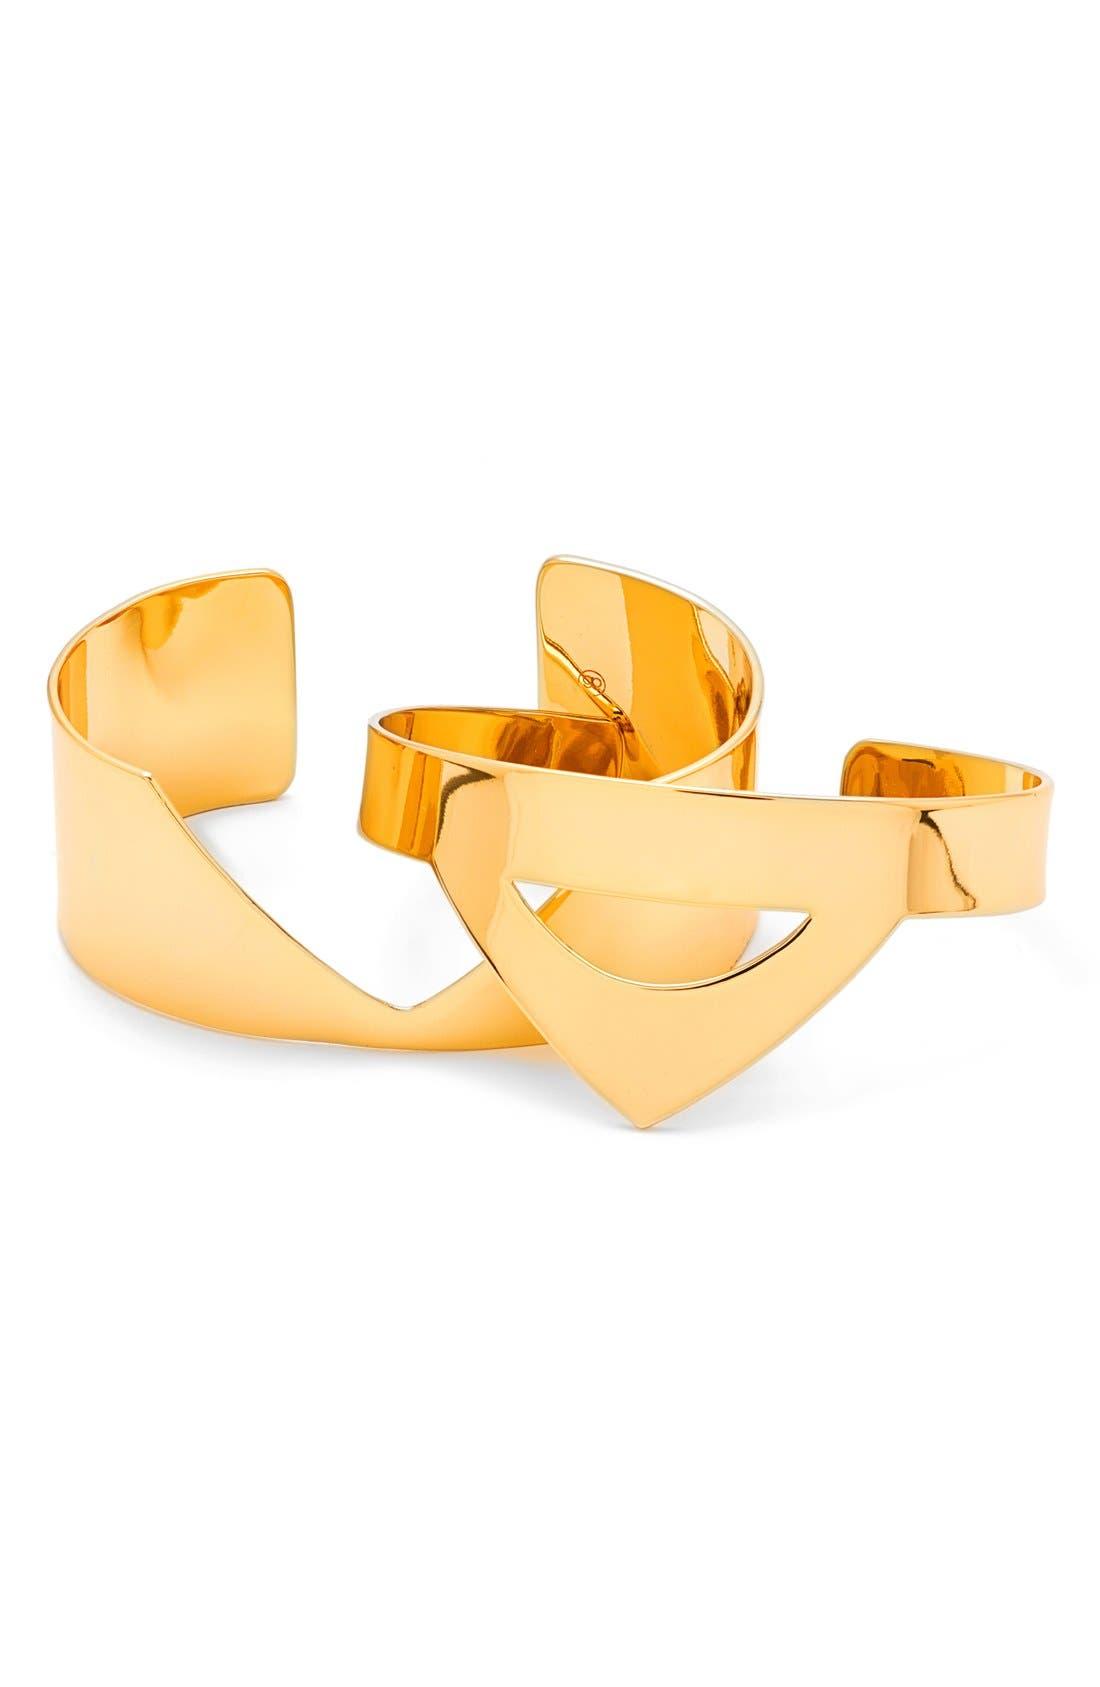 Alternate Image 3  - gorjana'Carter' Cuffs (Set of 2)